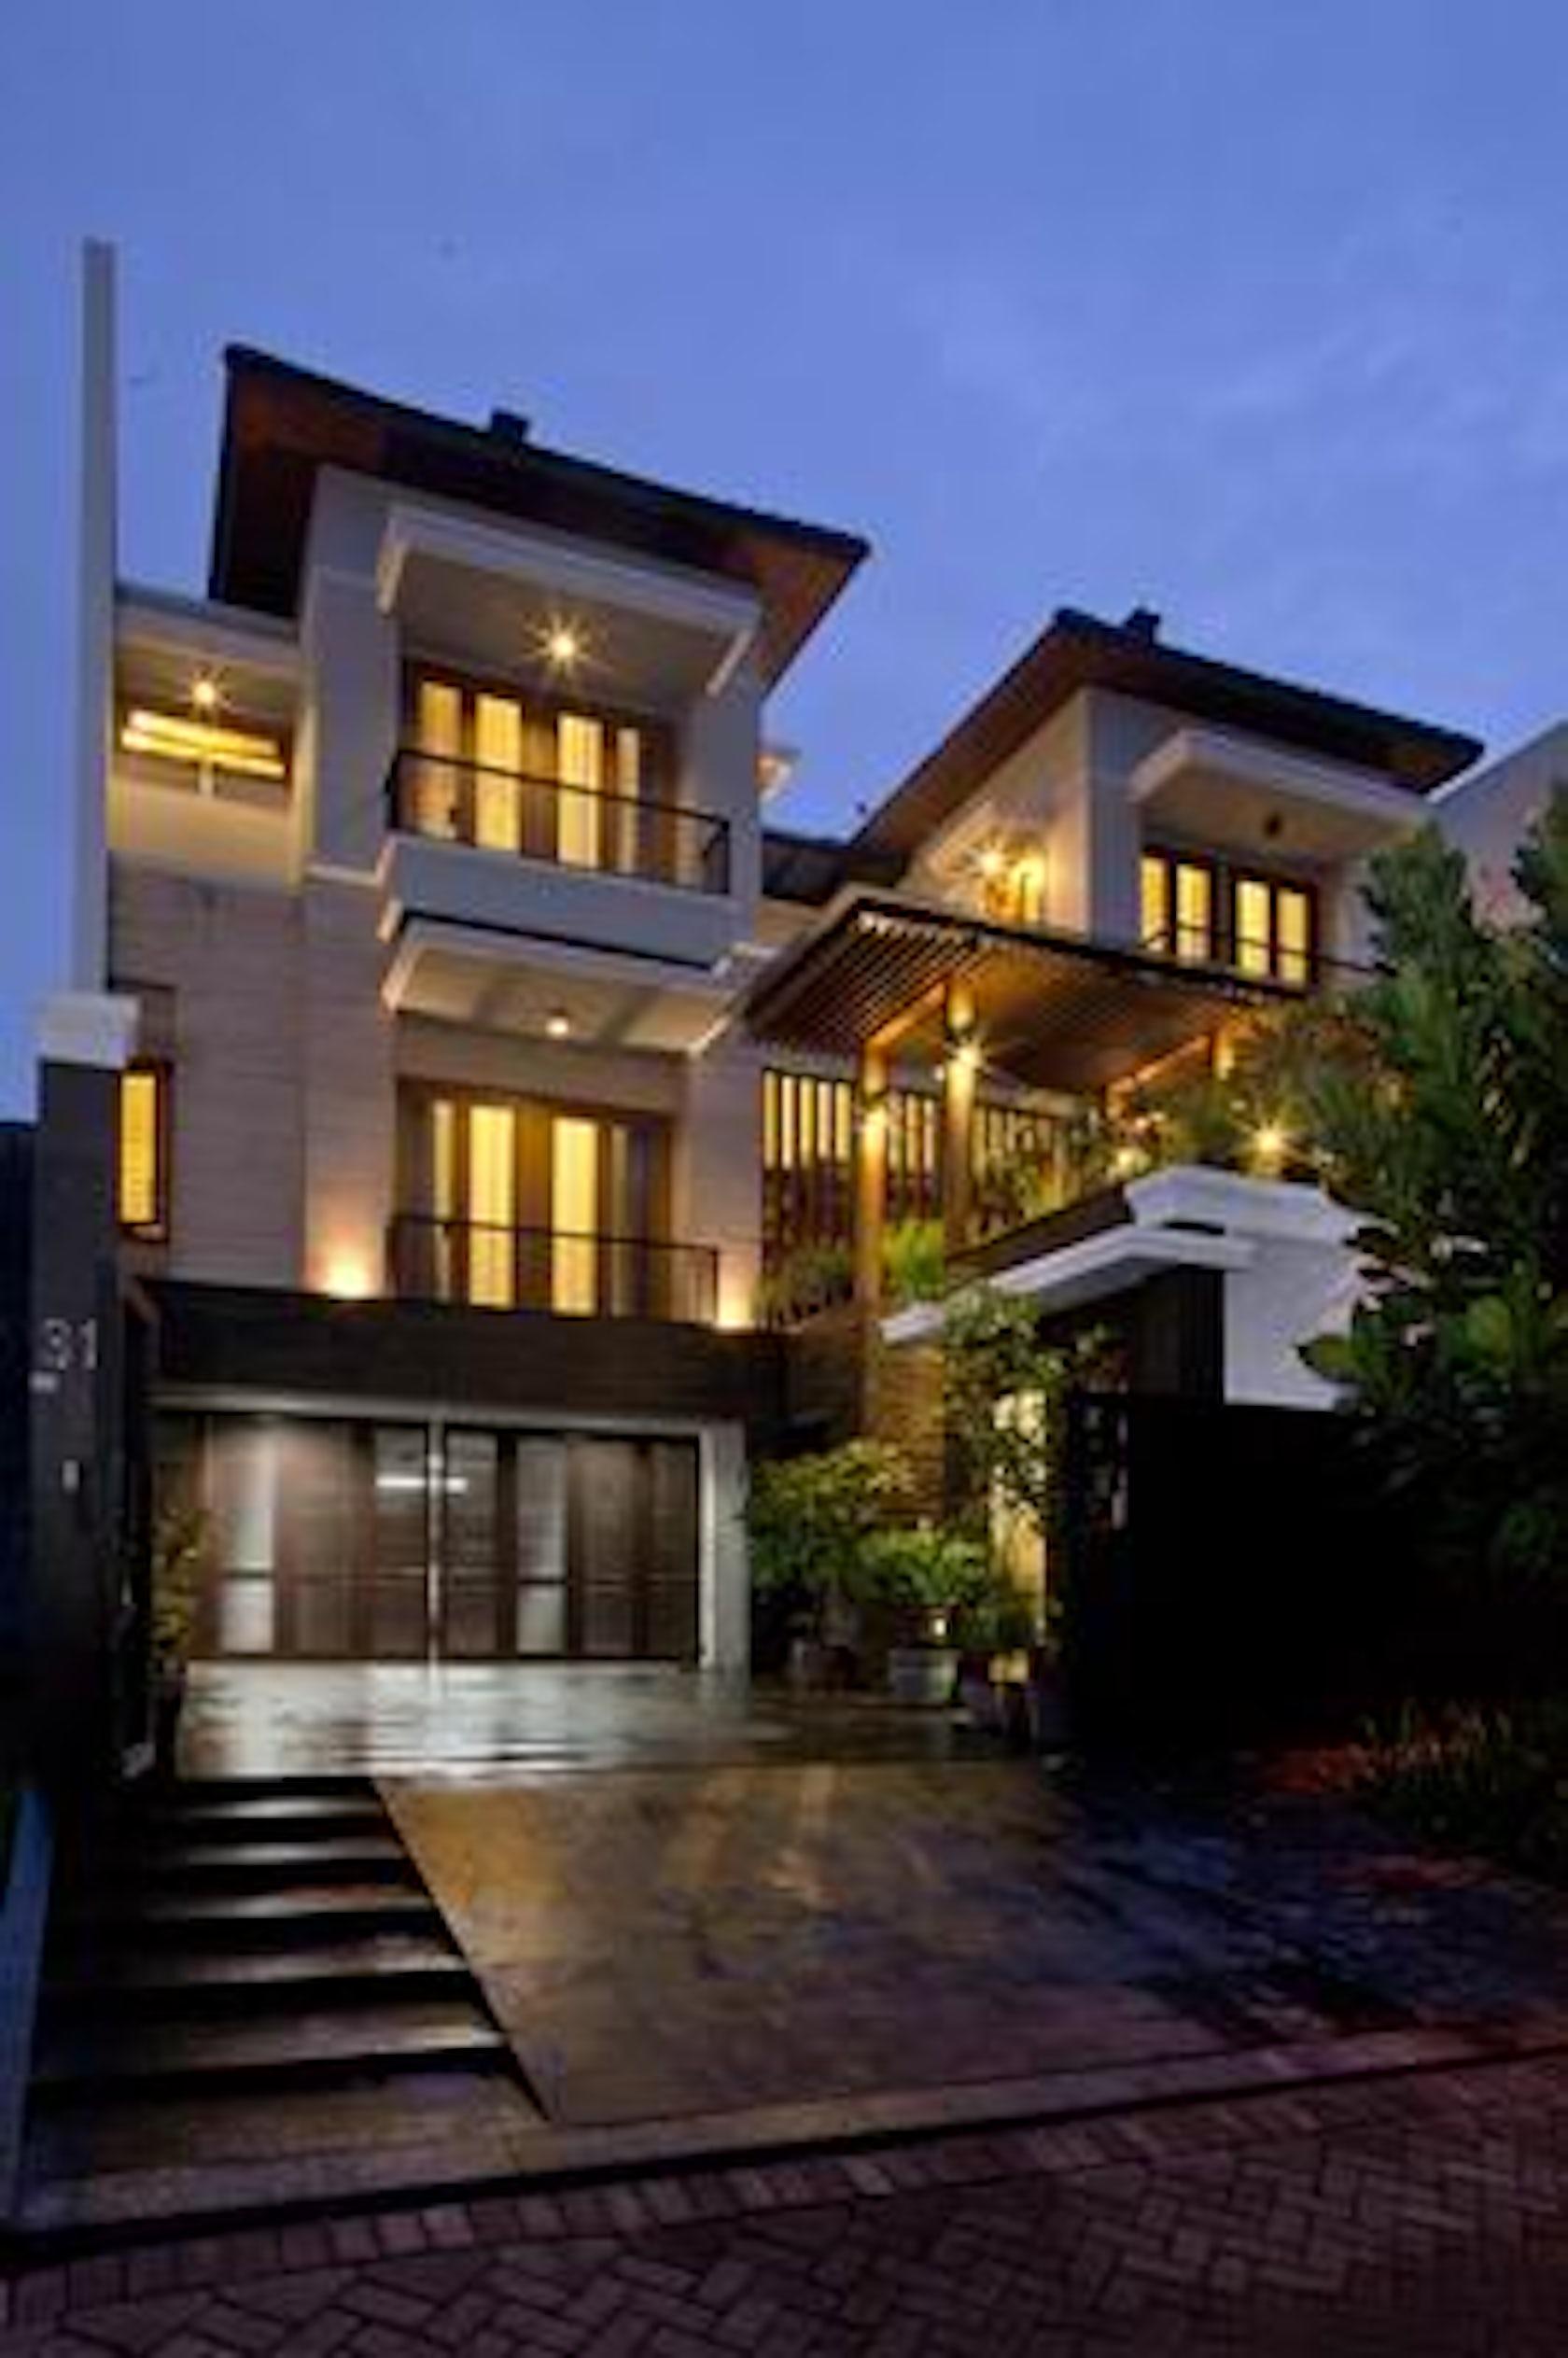 d7b969e9 - 24+ Small Modern House Design Pinterest Gif